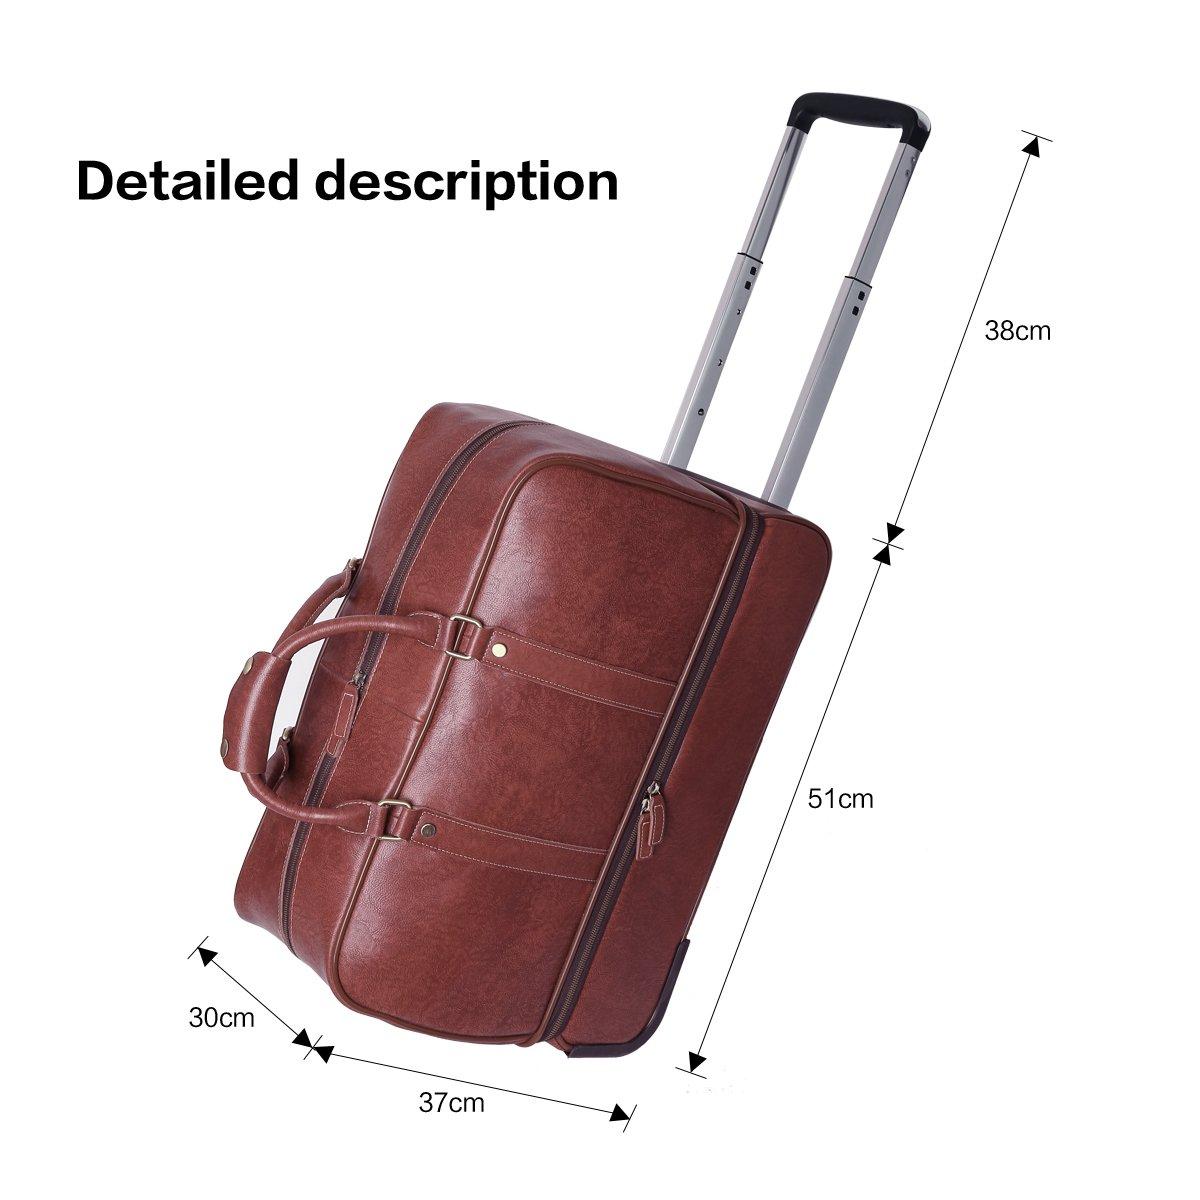 Leathario Leather Luggage travel duffle bag weekend overnight bag (Burgendy) by Leathario (Image #4)